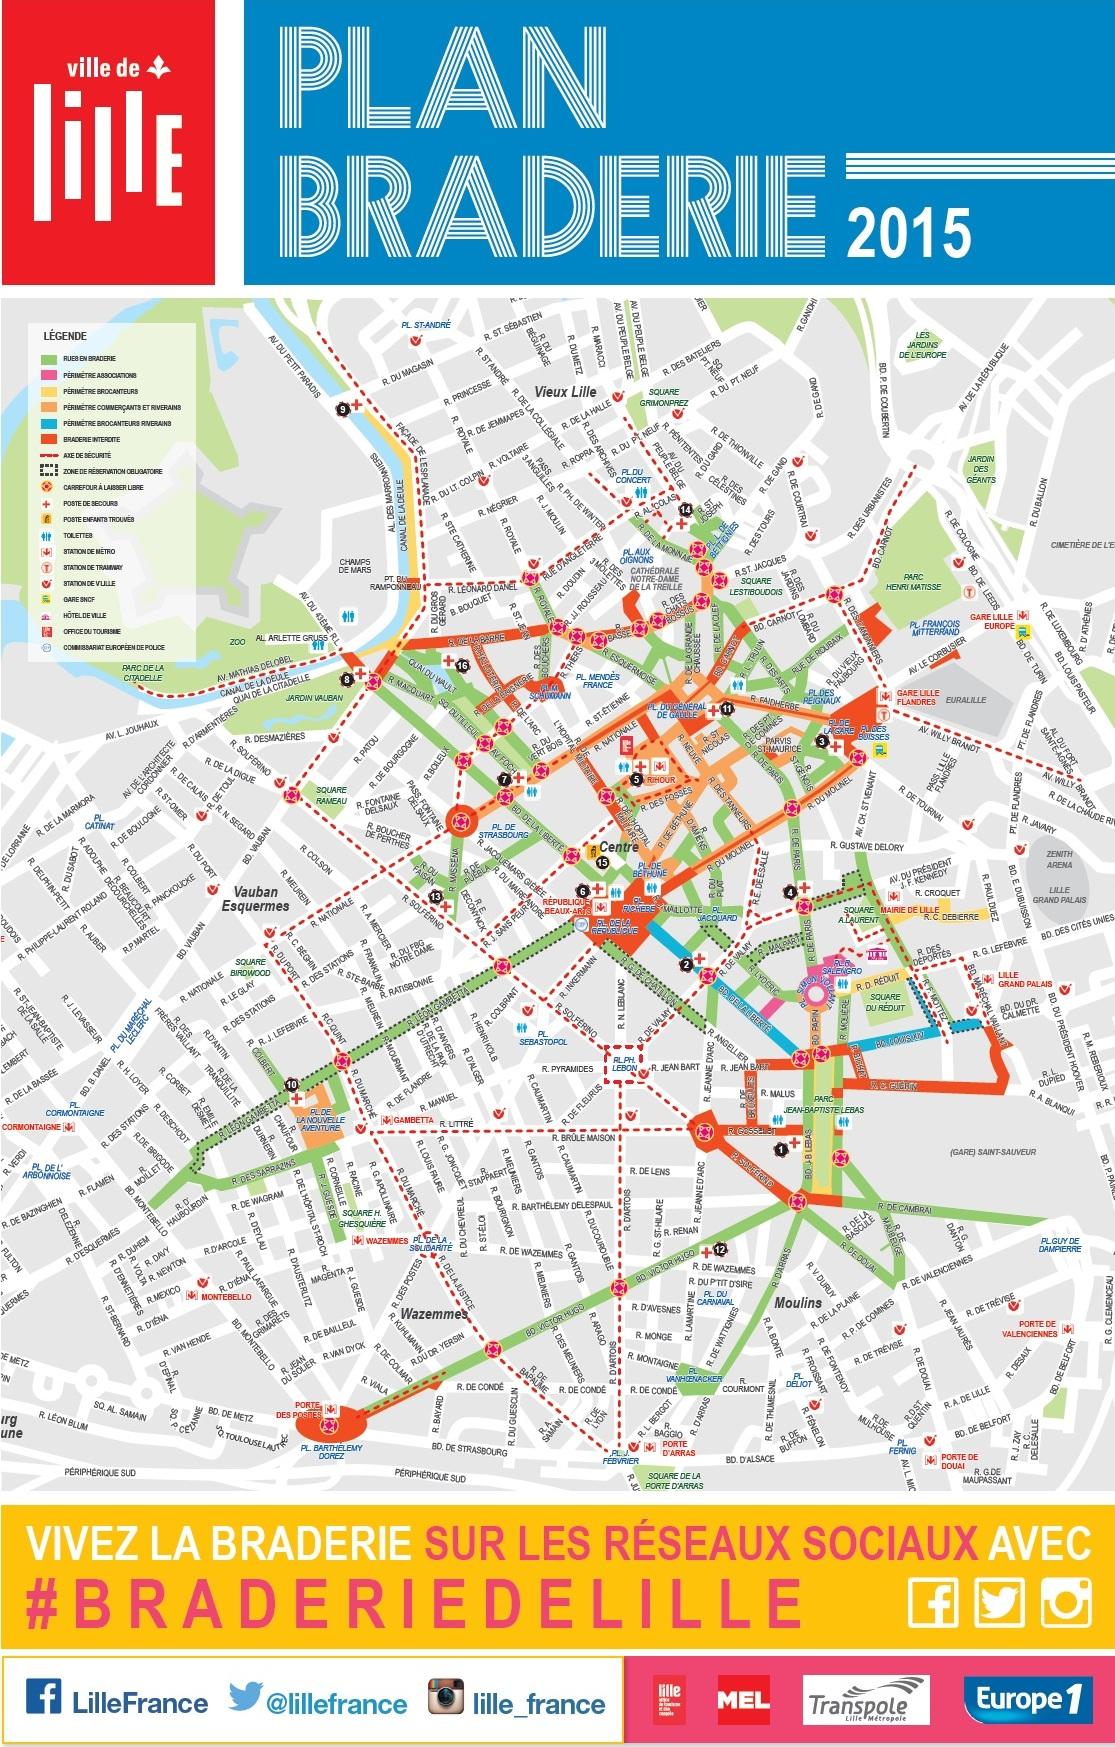 Plan de la Braderie de Lille 2015